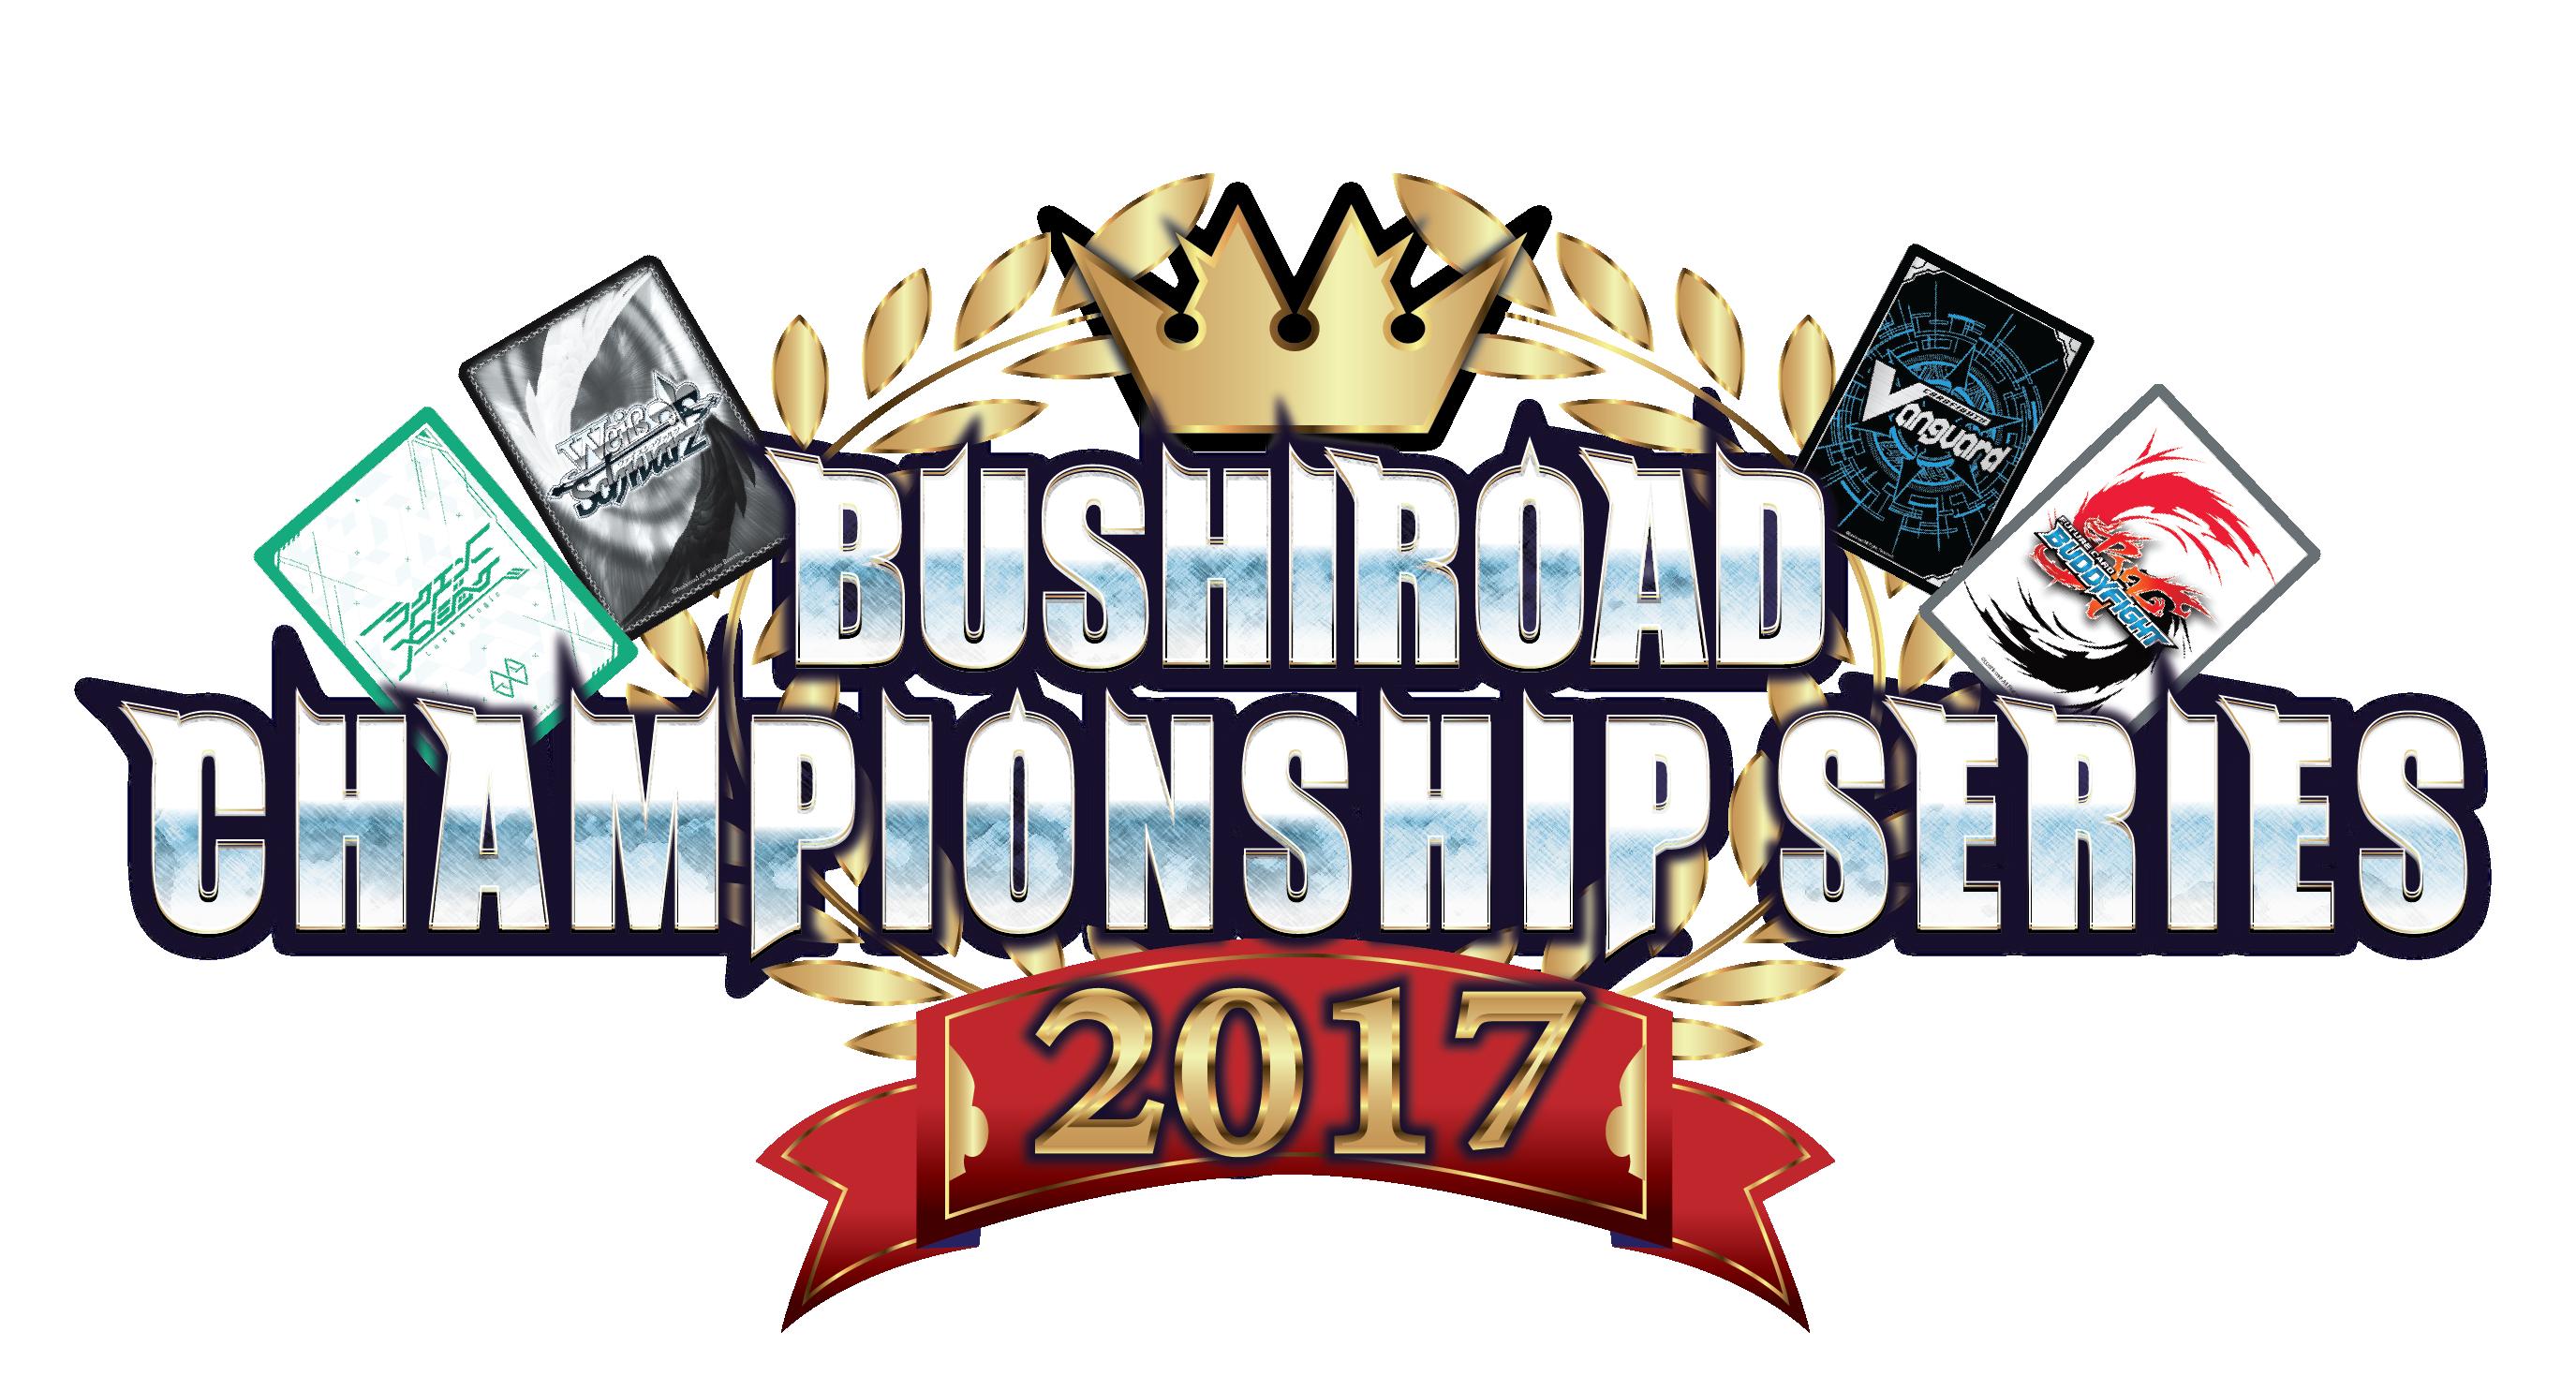 Bushiroad Championship Series 2017